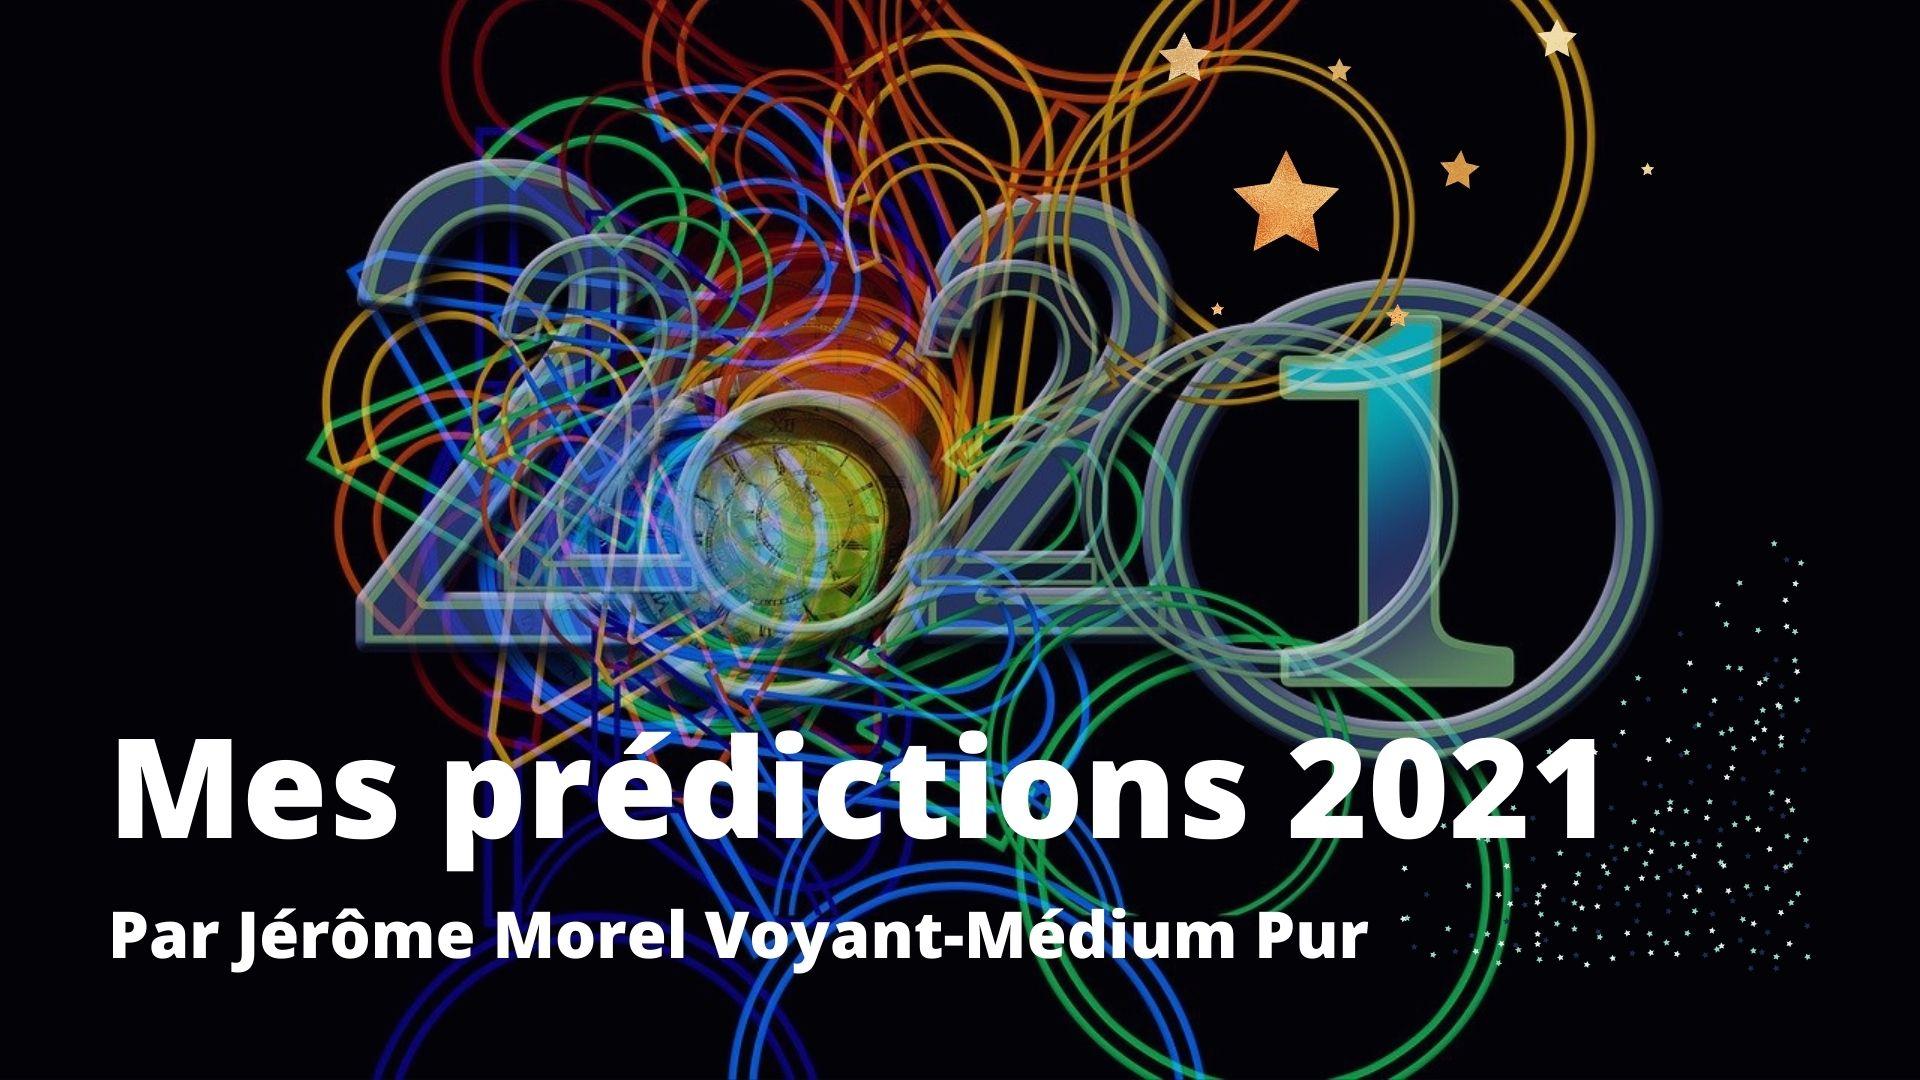 predictions 2021 jerome morel voyance